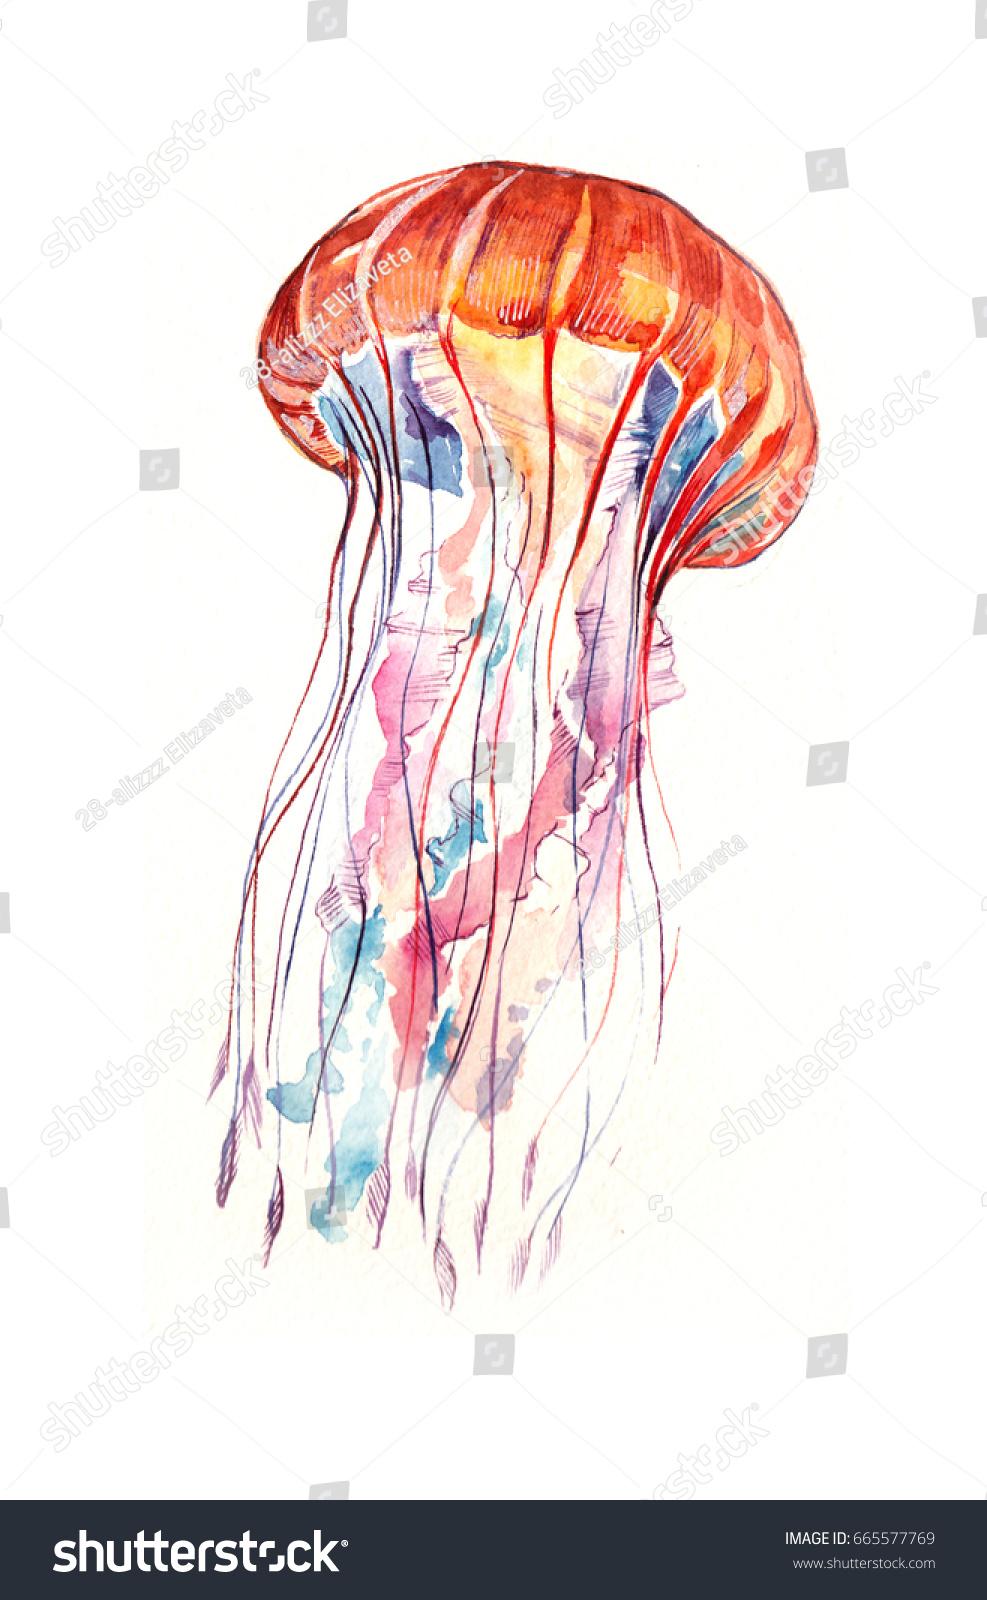 Jellyfish Watercolor Stock Illustration 665577769 - Shutterstock